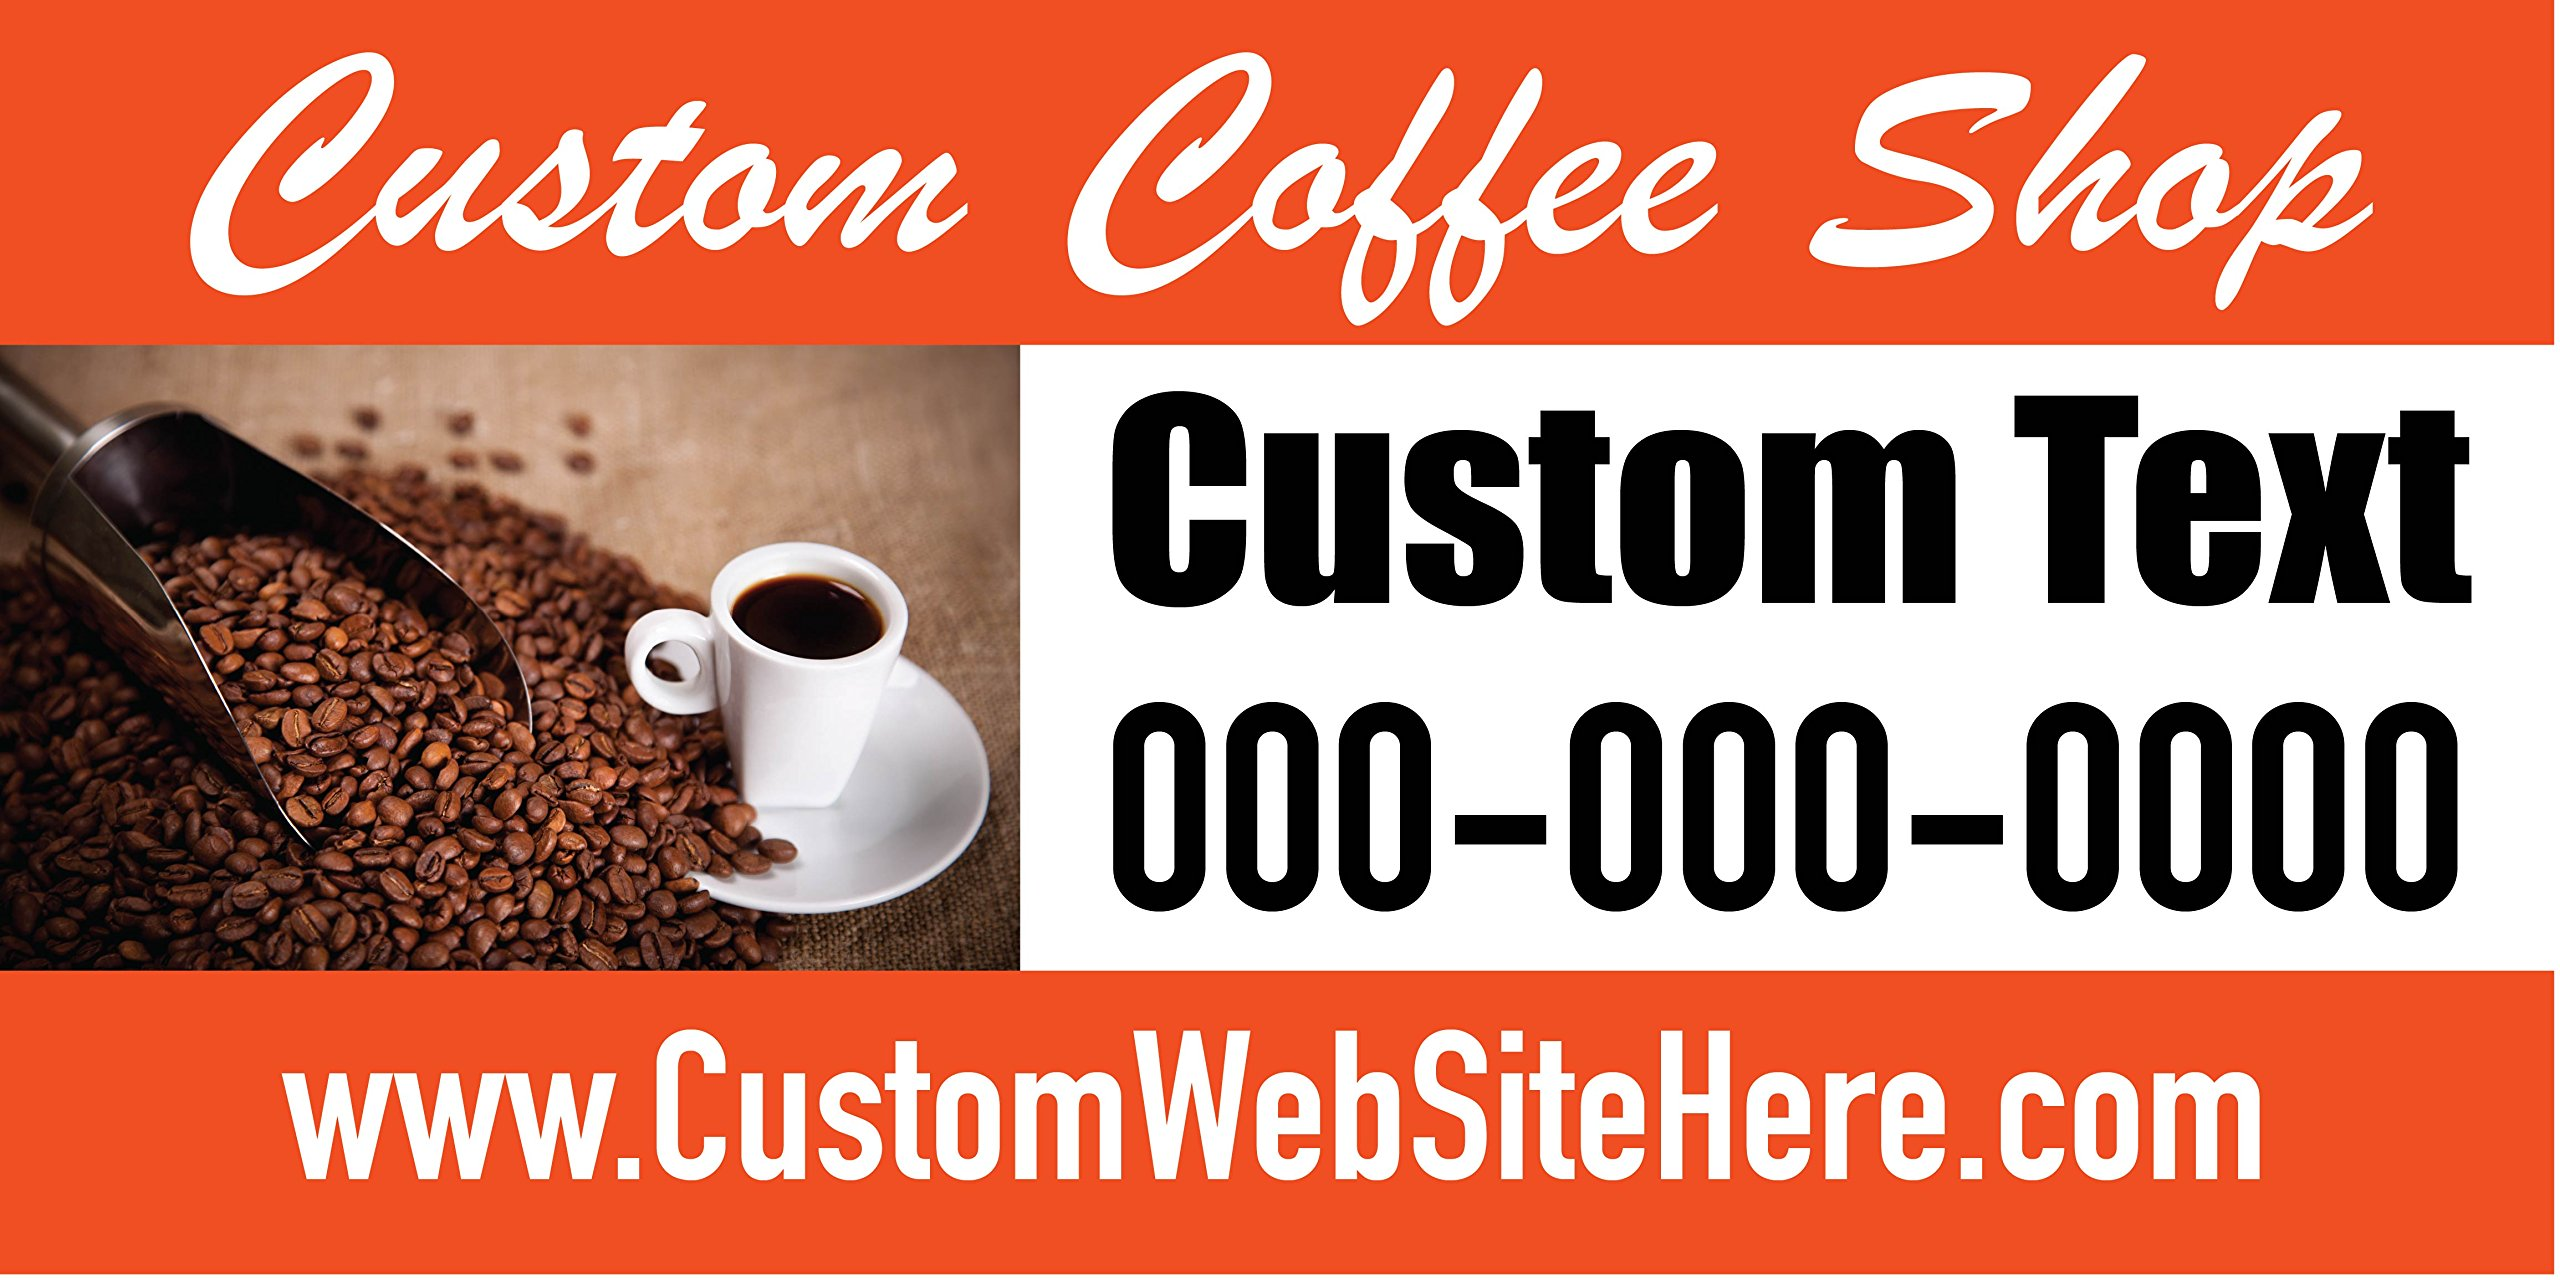 Custom Printed Coffee Shop Banner - Beans Orange(10' x 5')